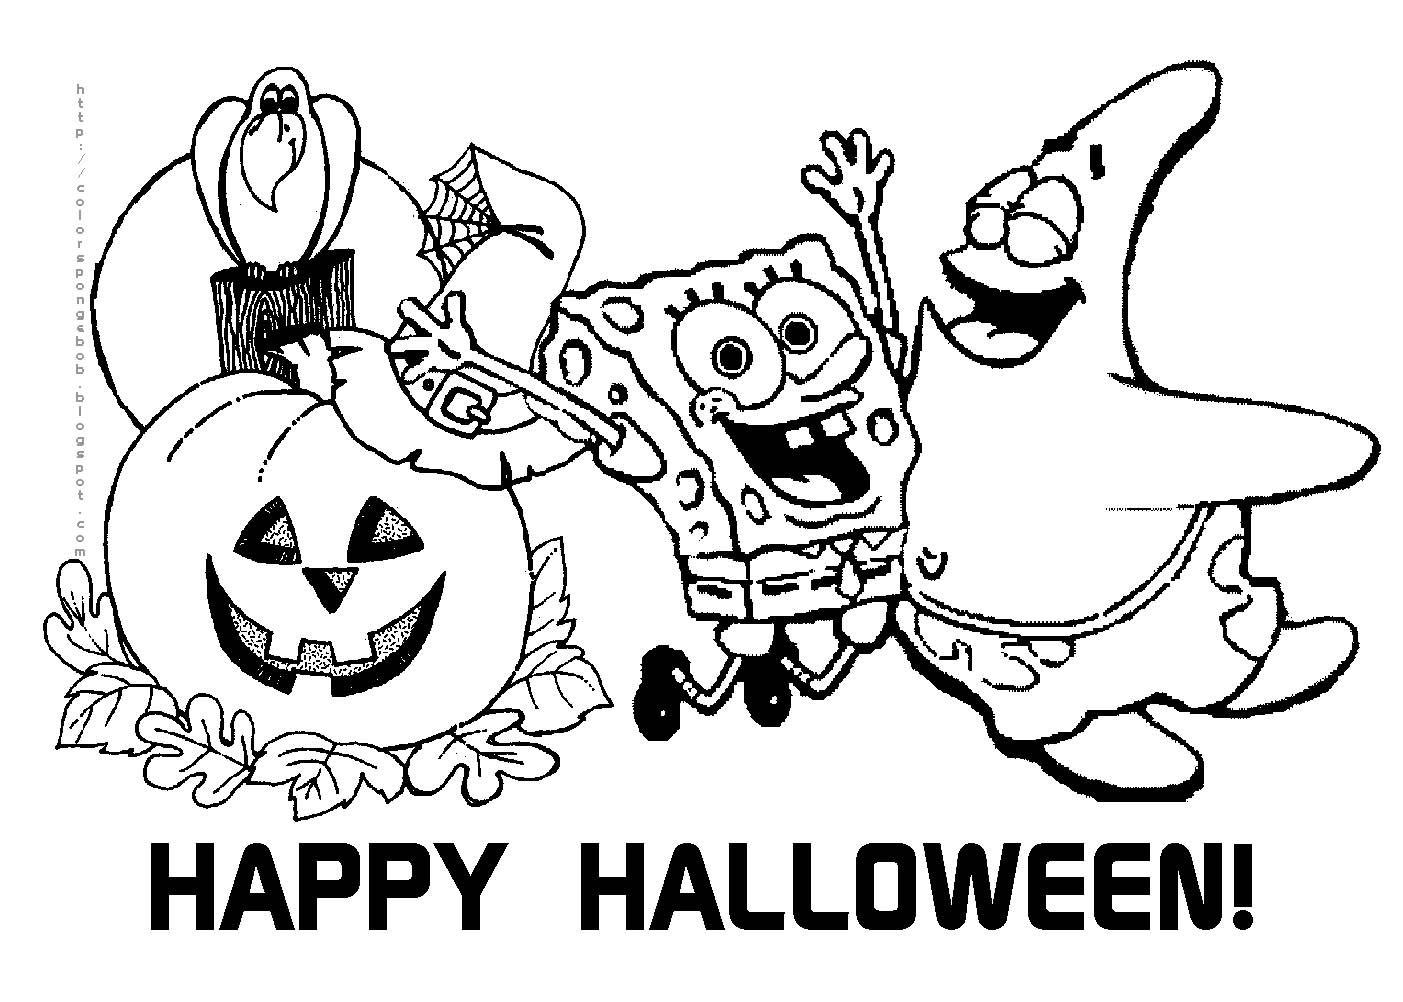 Free printable halloween calendar halloween spongebob squarepants coloring sheet free